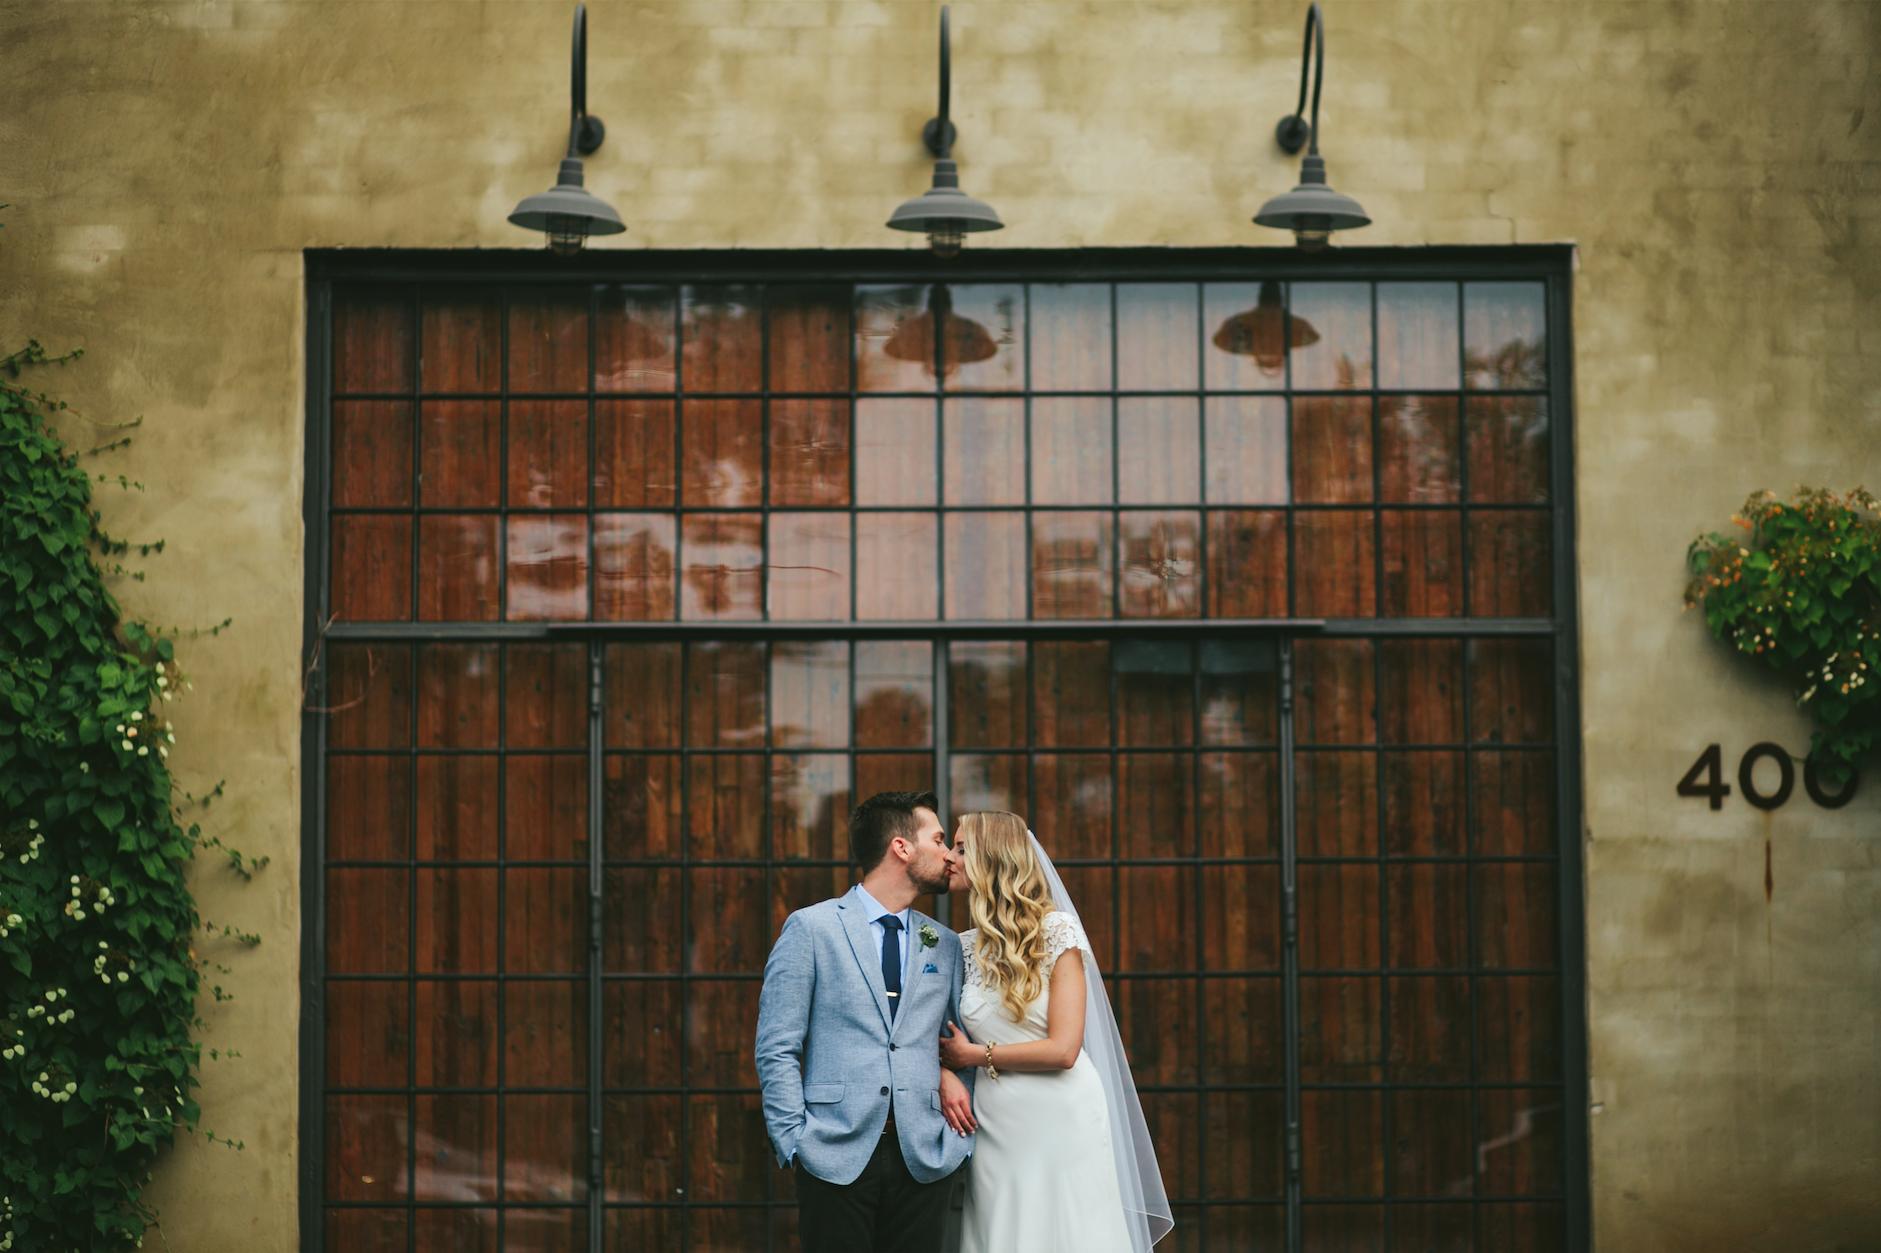 Summerour wedding photos